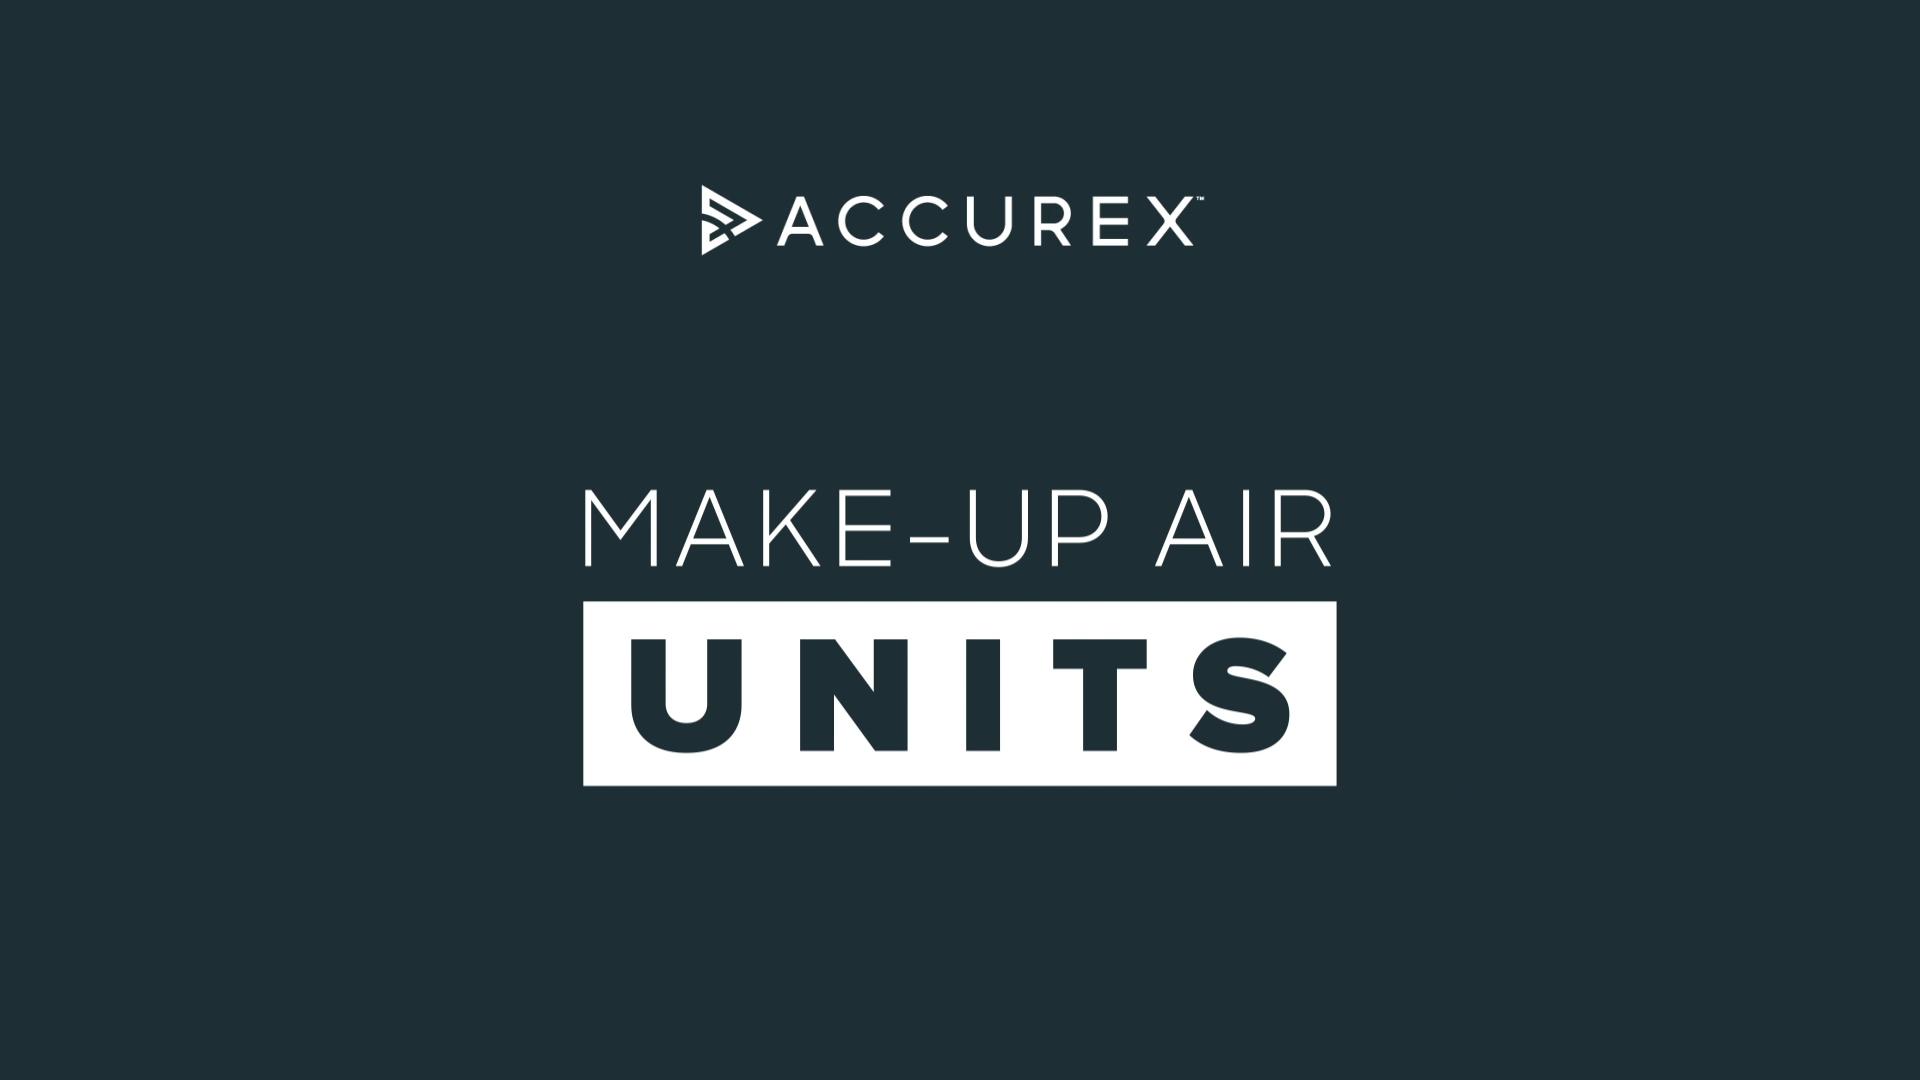 Make-up Air Unit Video Screenshot